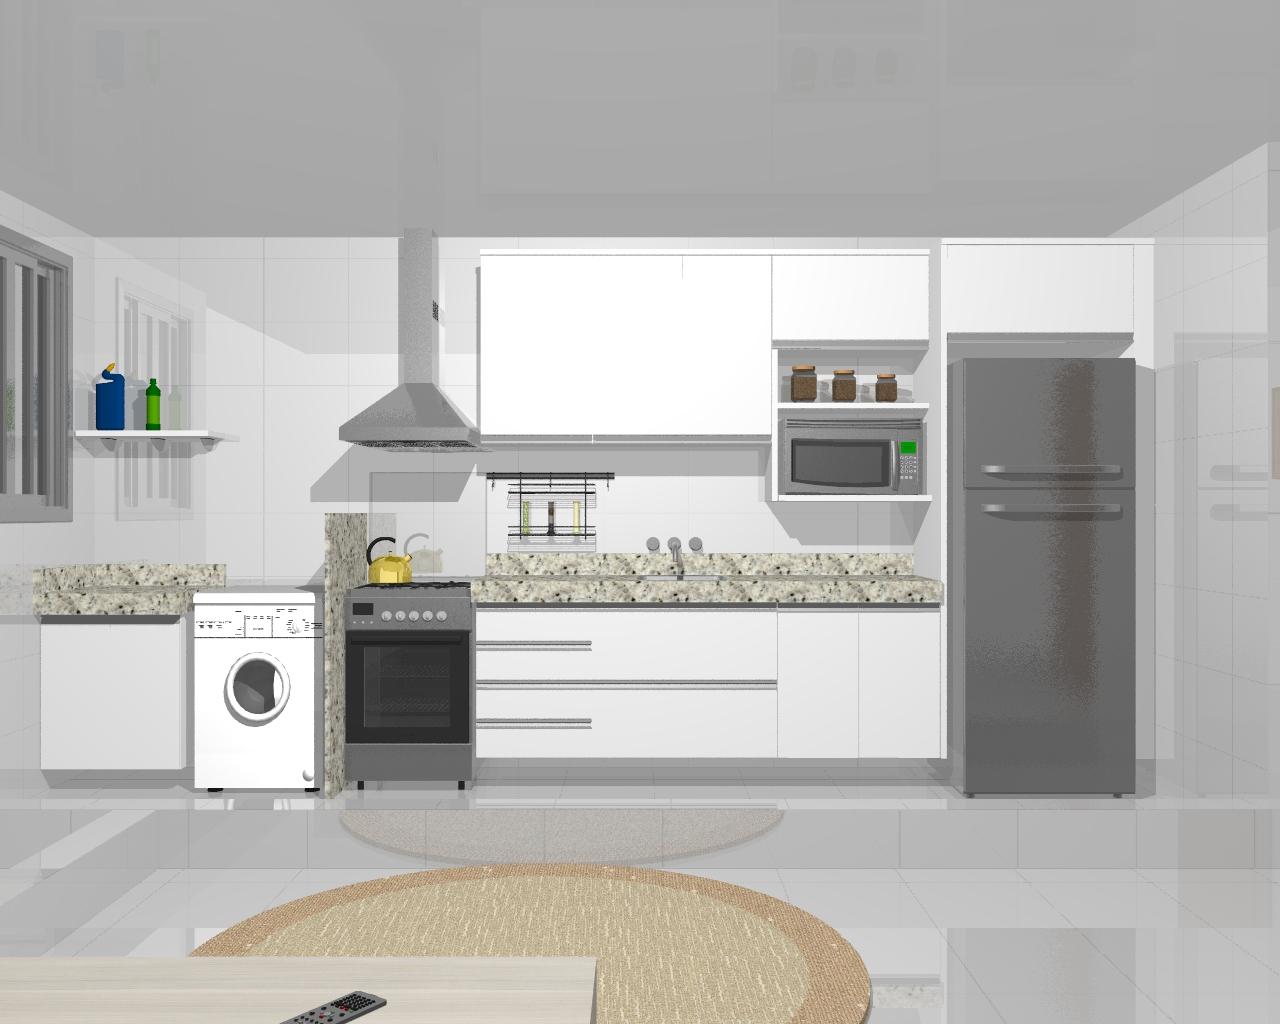 apartamento mrv projetos apartamento mrv projetos apartamento mrv #04366D 1280 1024